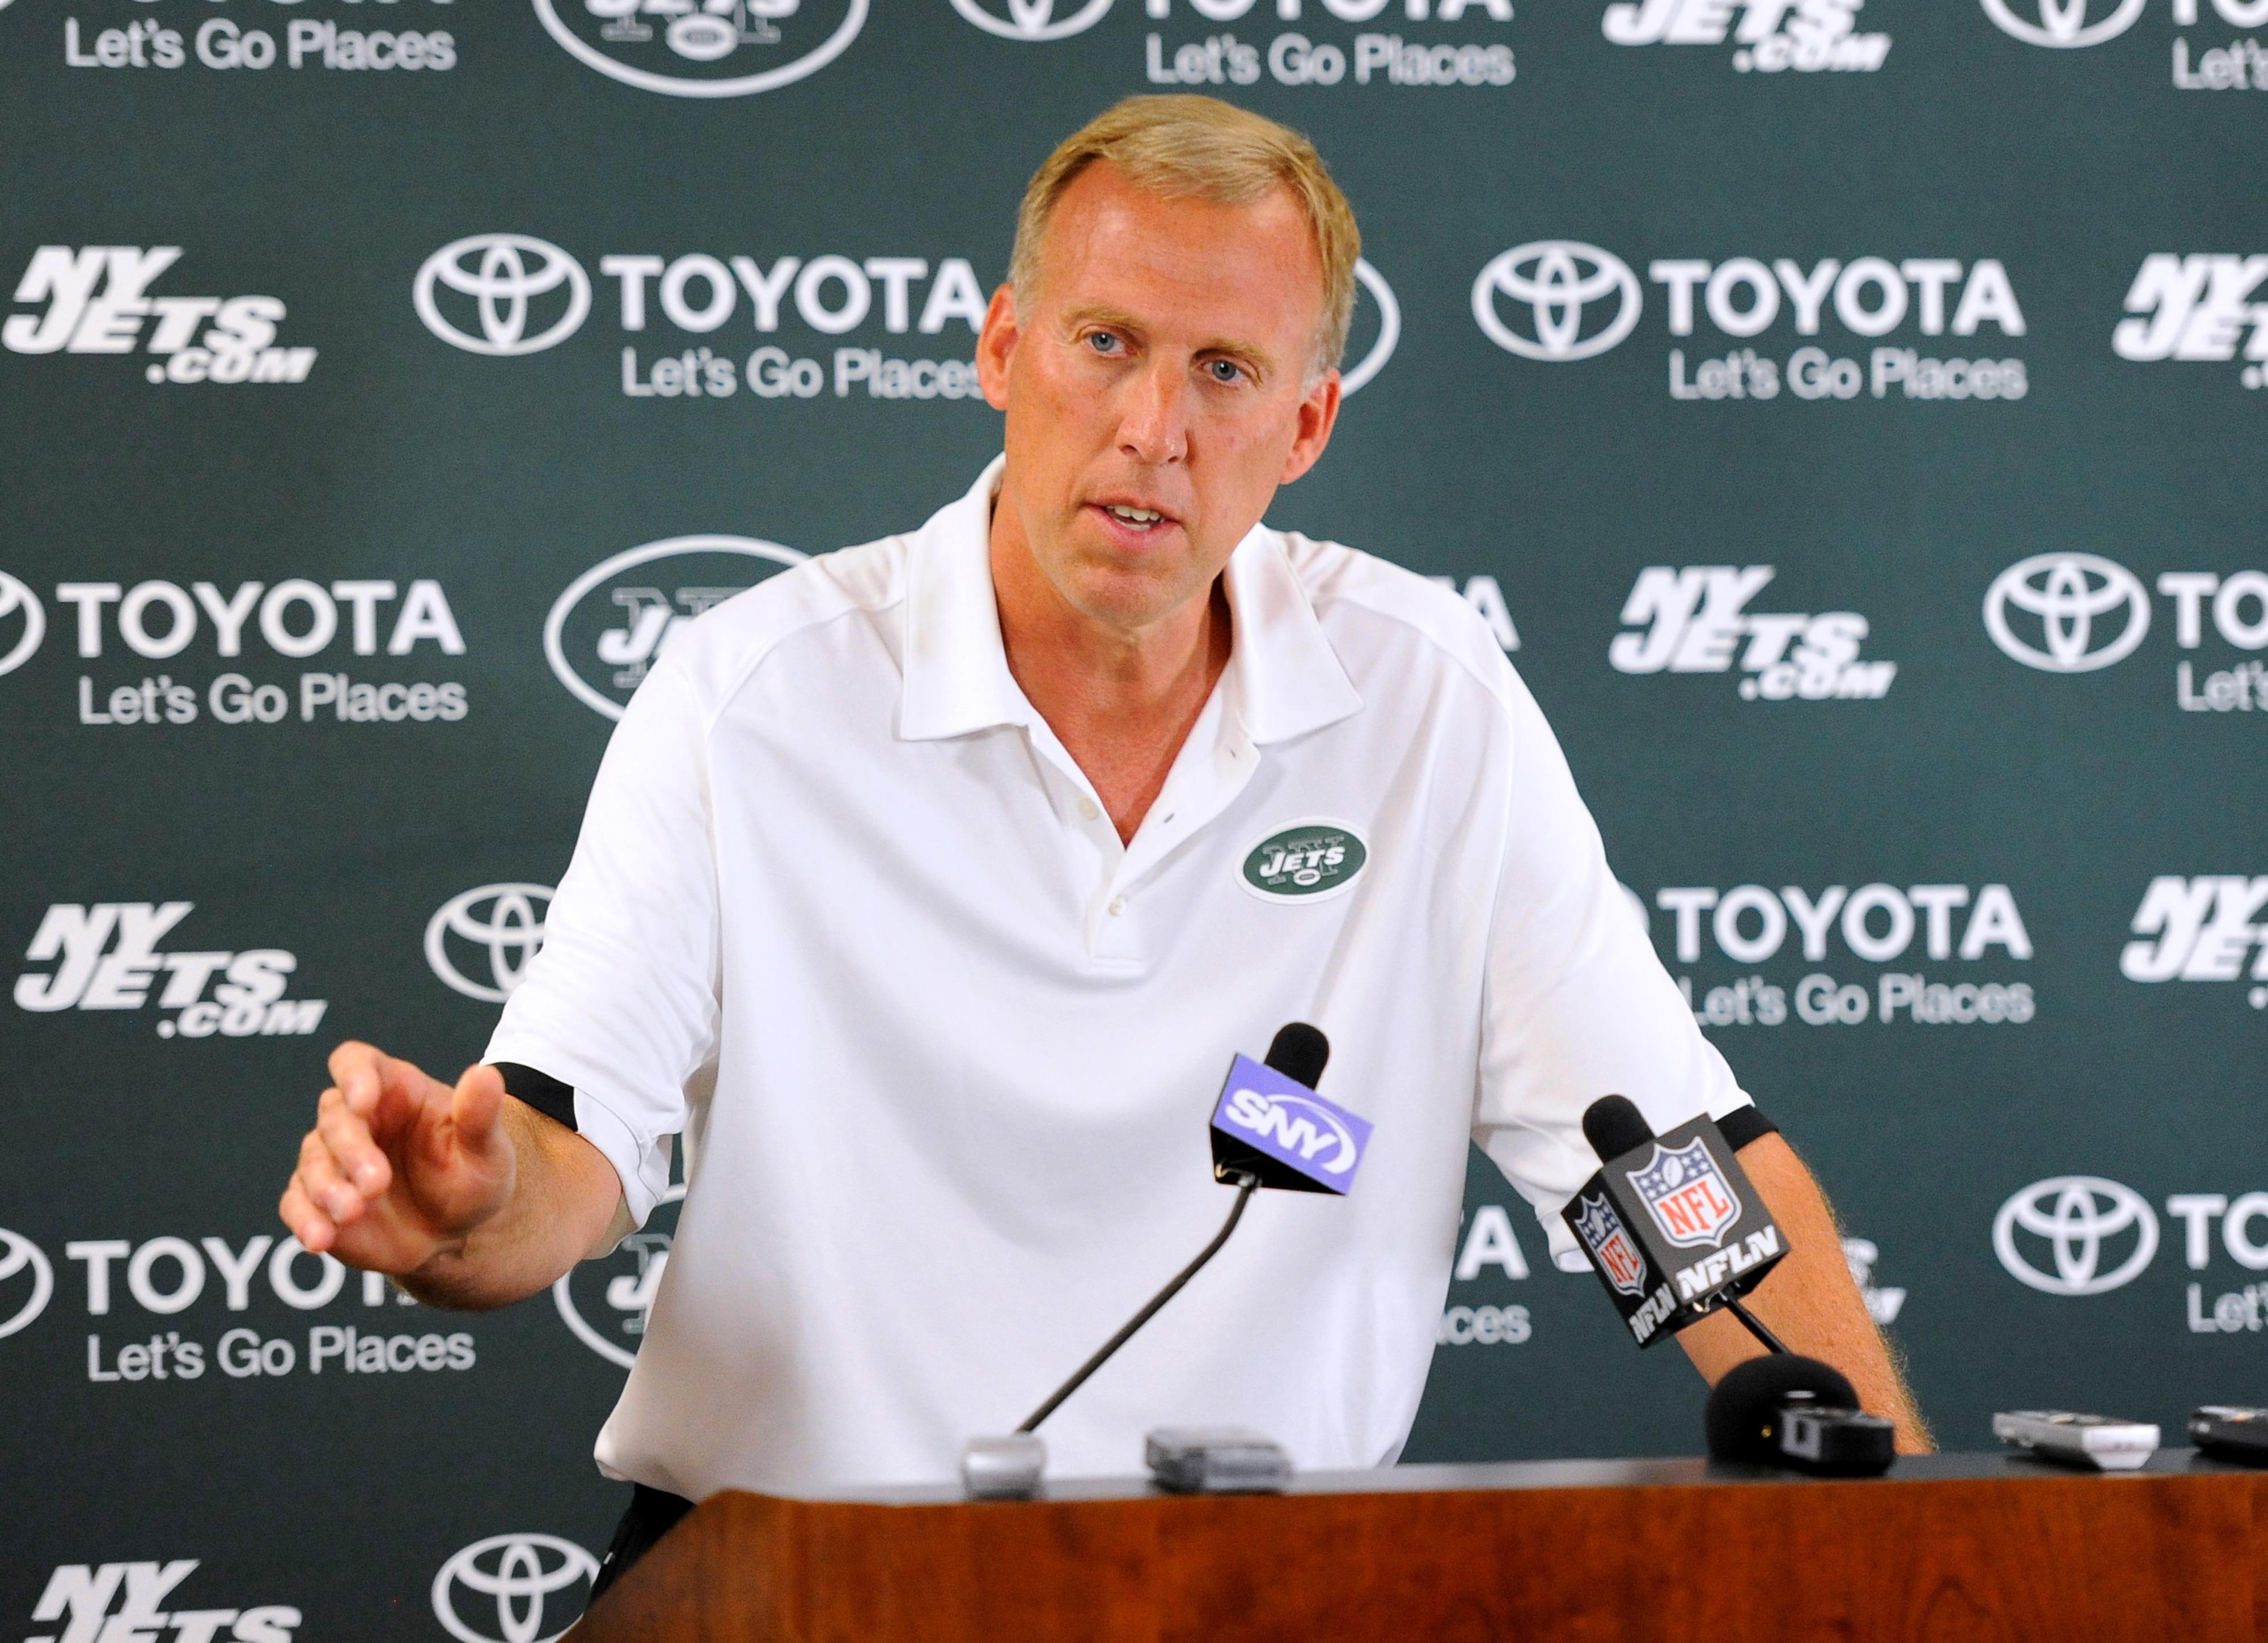 Jets' GM John Idzik